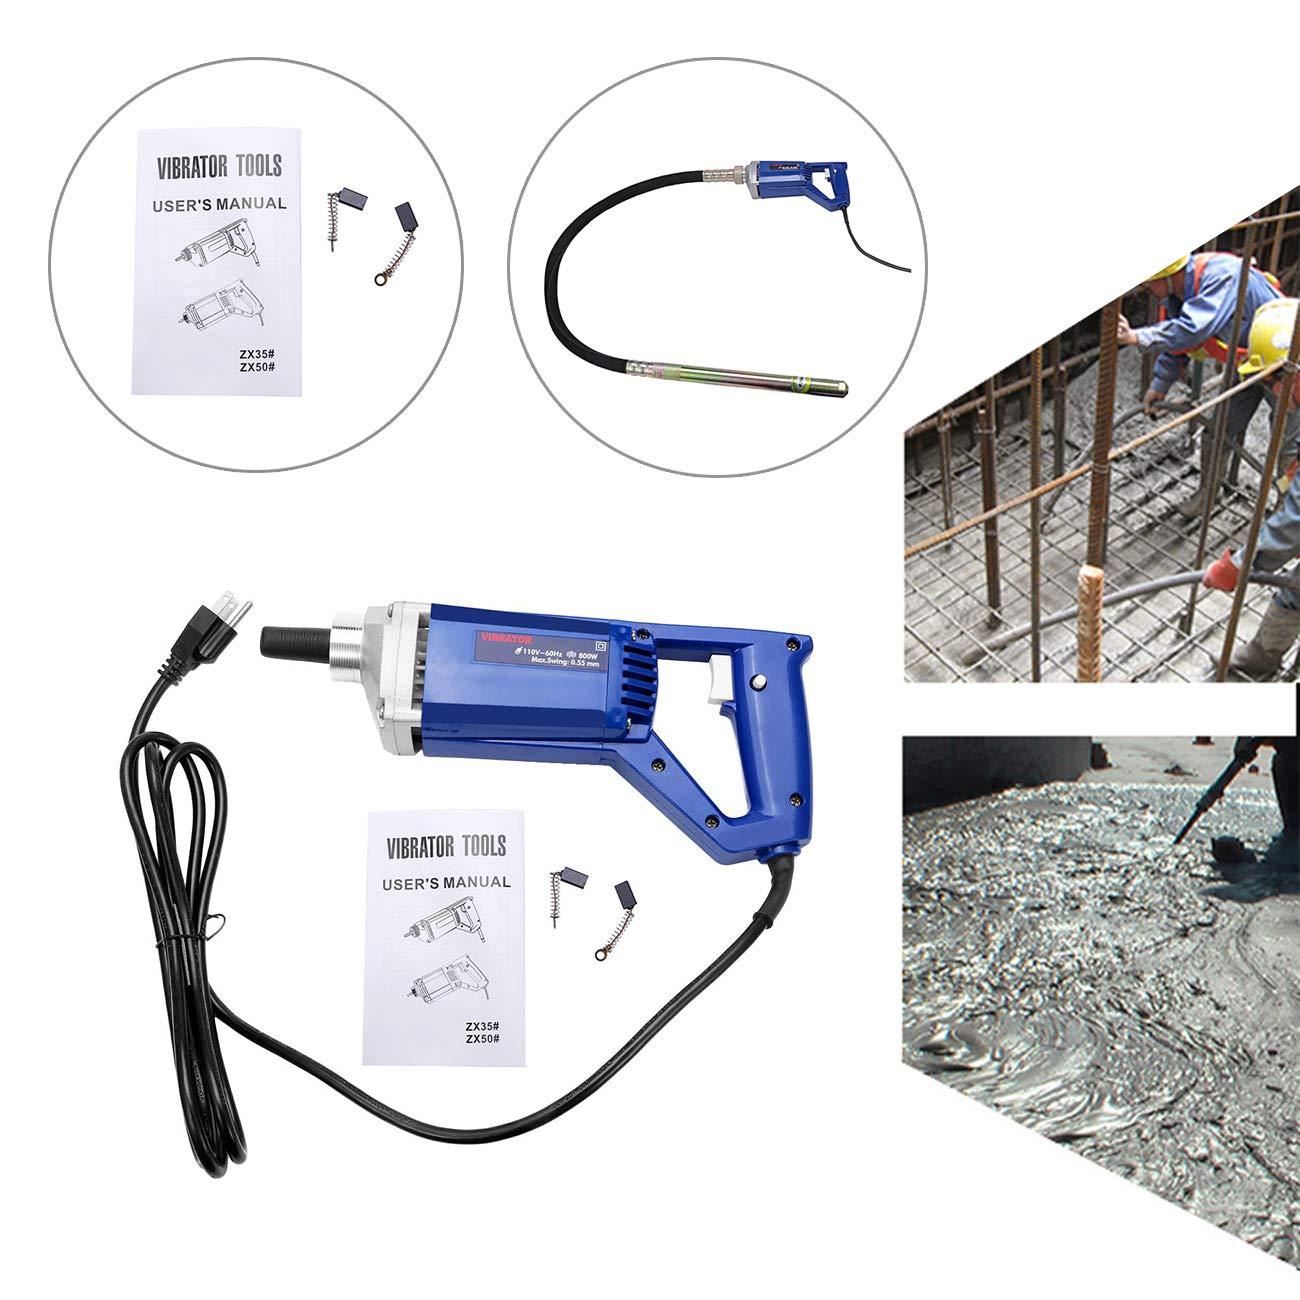 BEAMNOVA Electric Concrete Vibrator Hand Held 13000 VPM 4.9 Feet Shaft